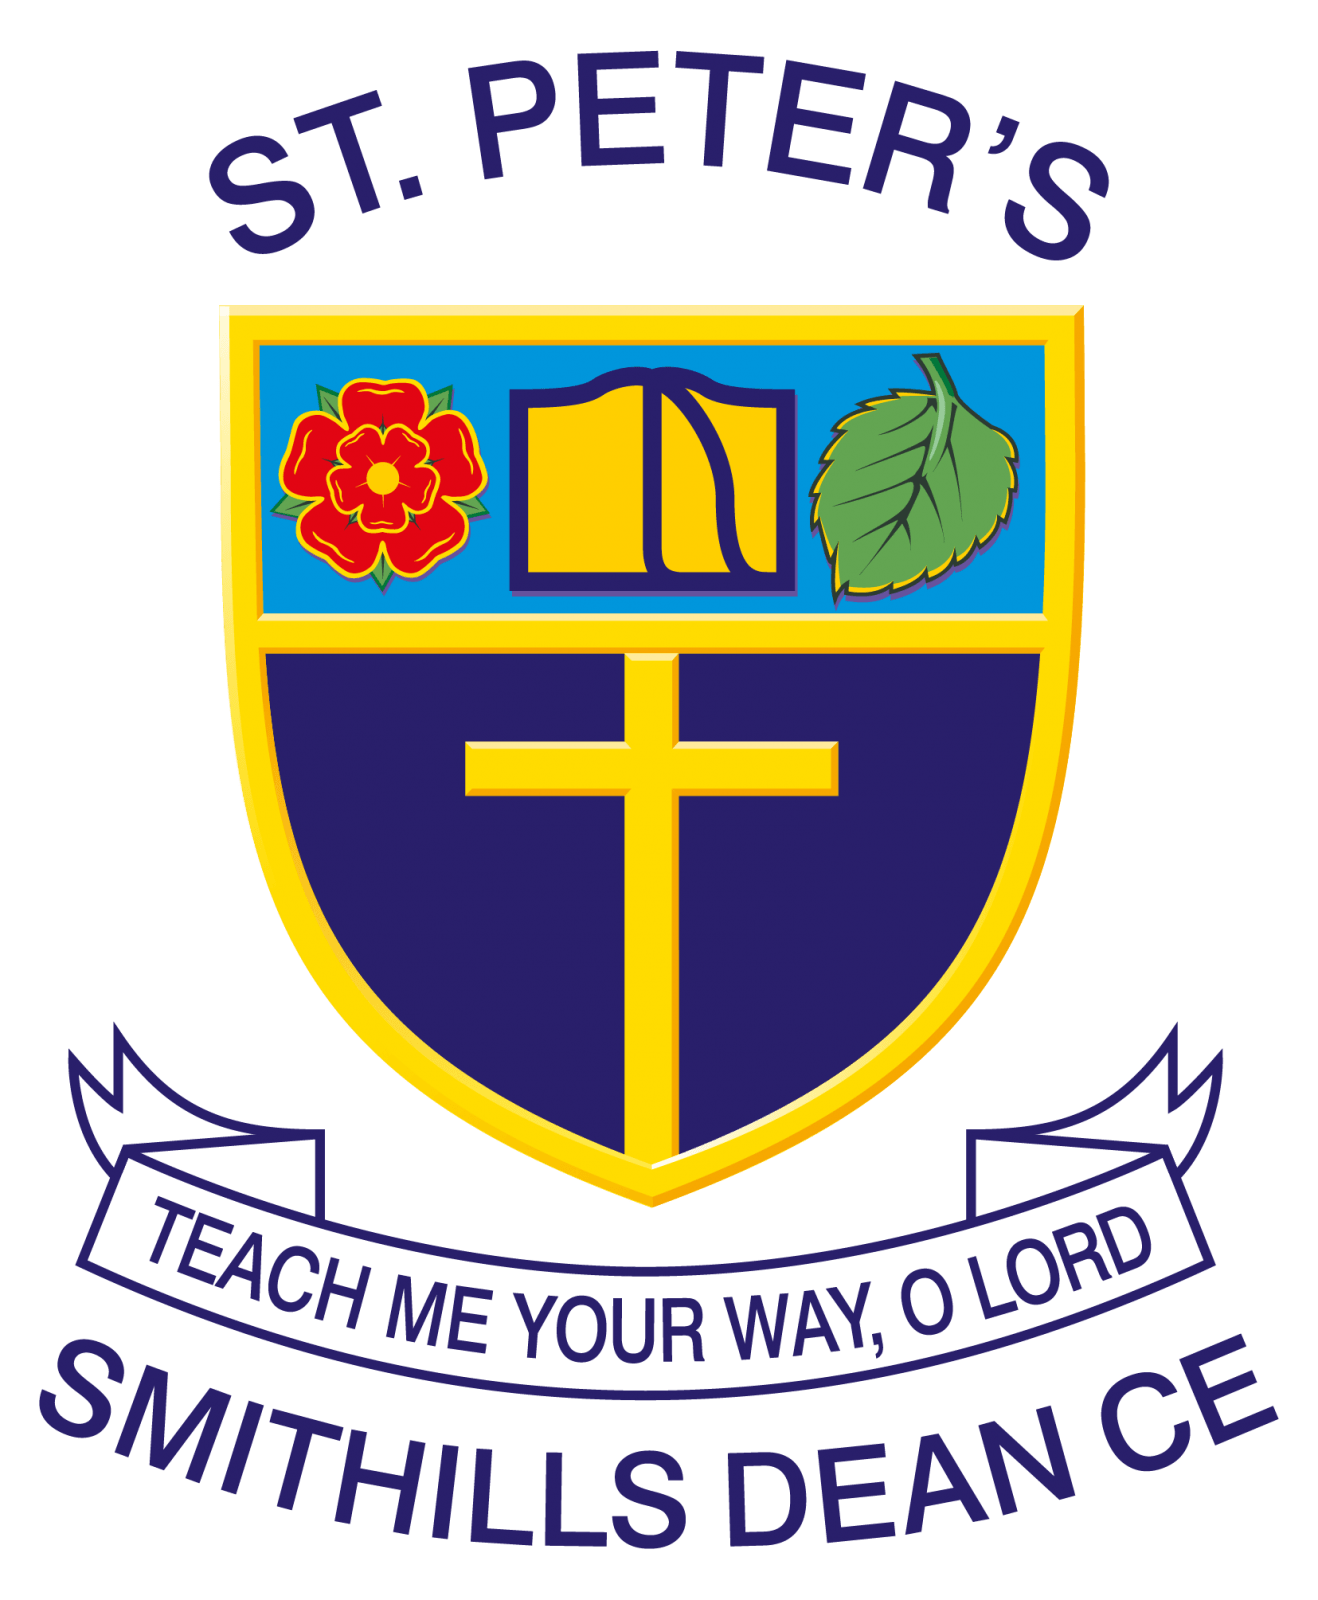 St Peter's Smithills Dean CE Primary School